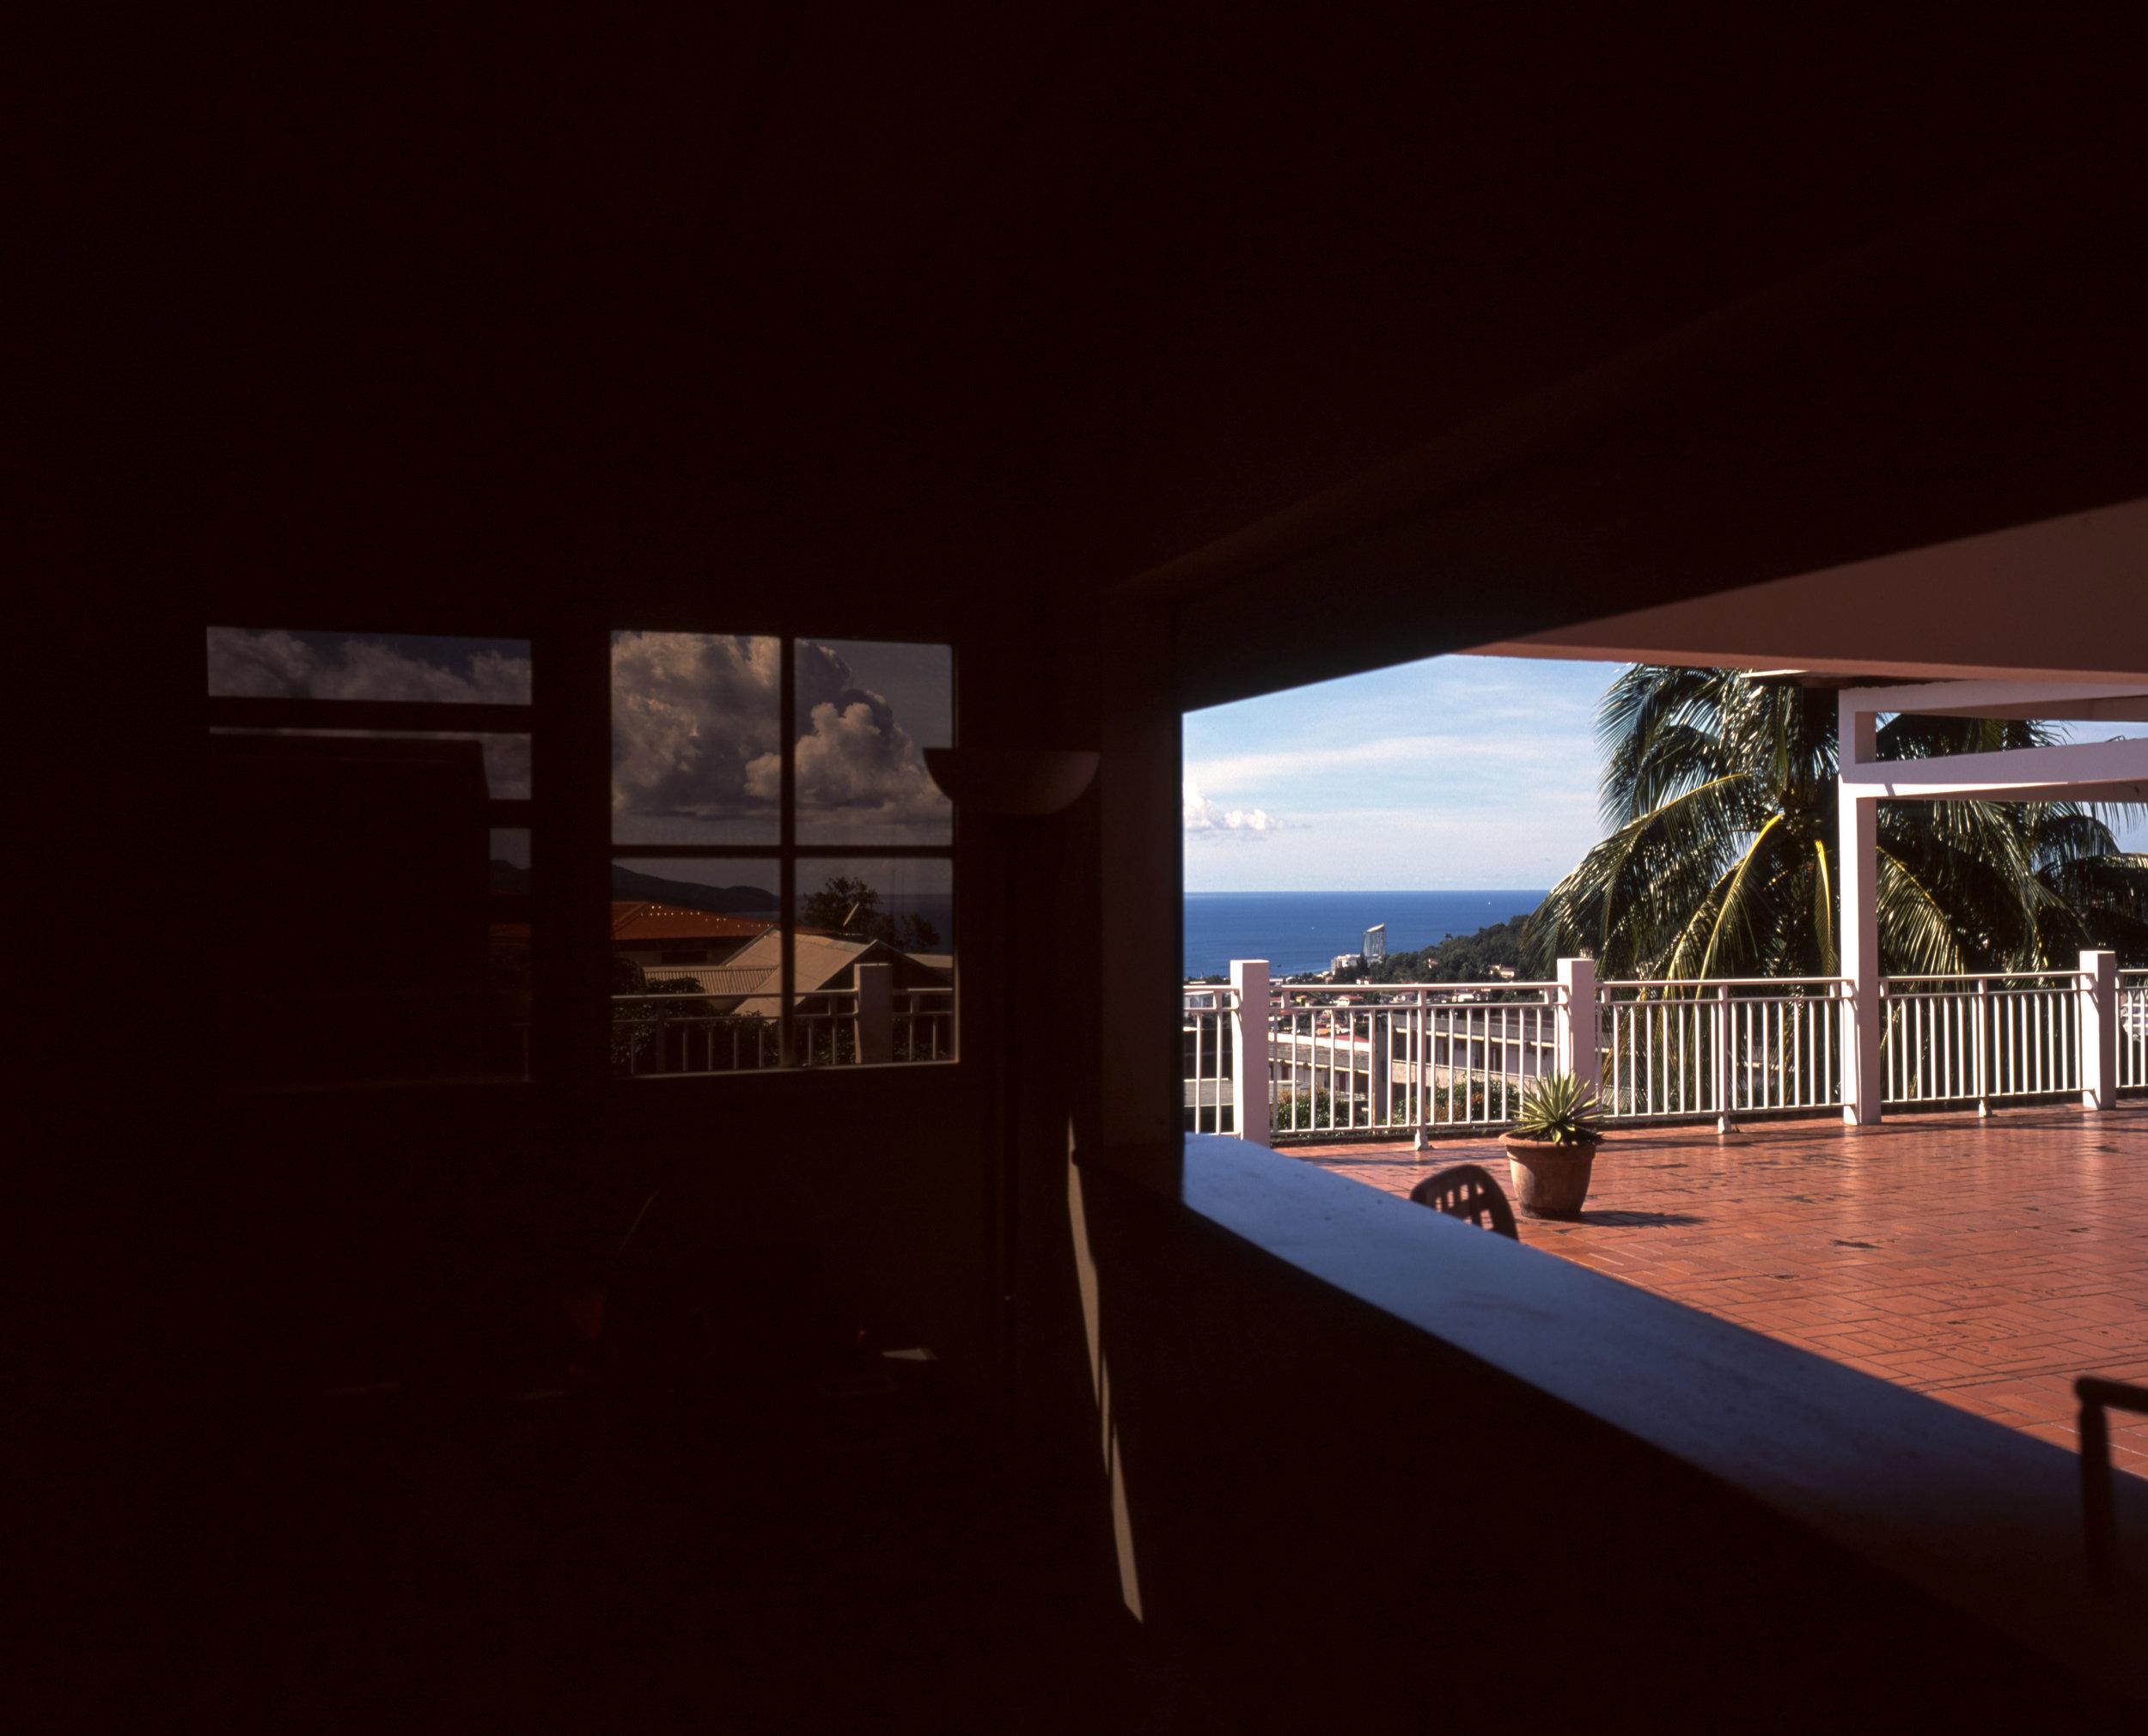 View from our kitchen Fuji GF670w | Fuji Provia 100f